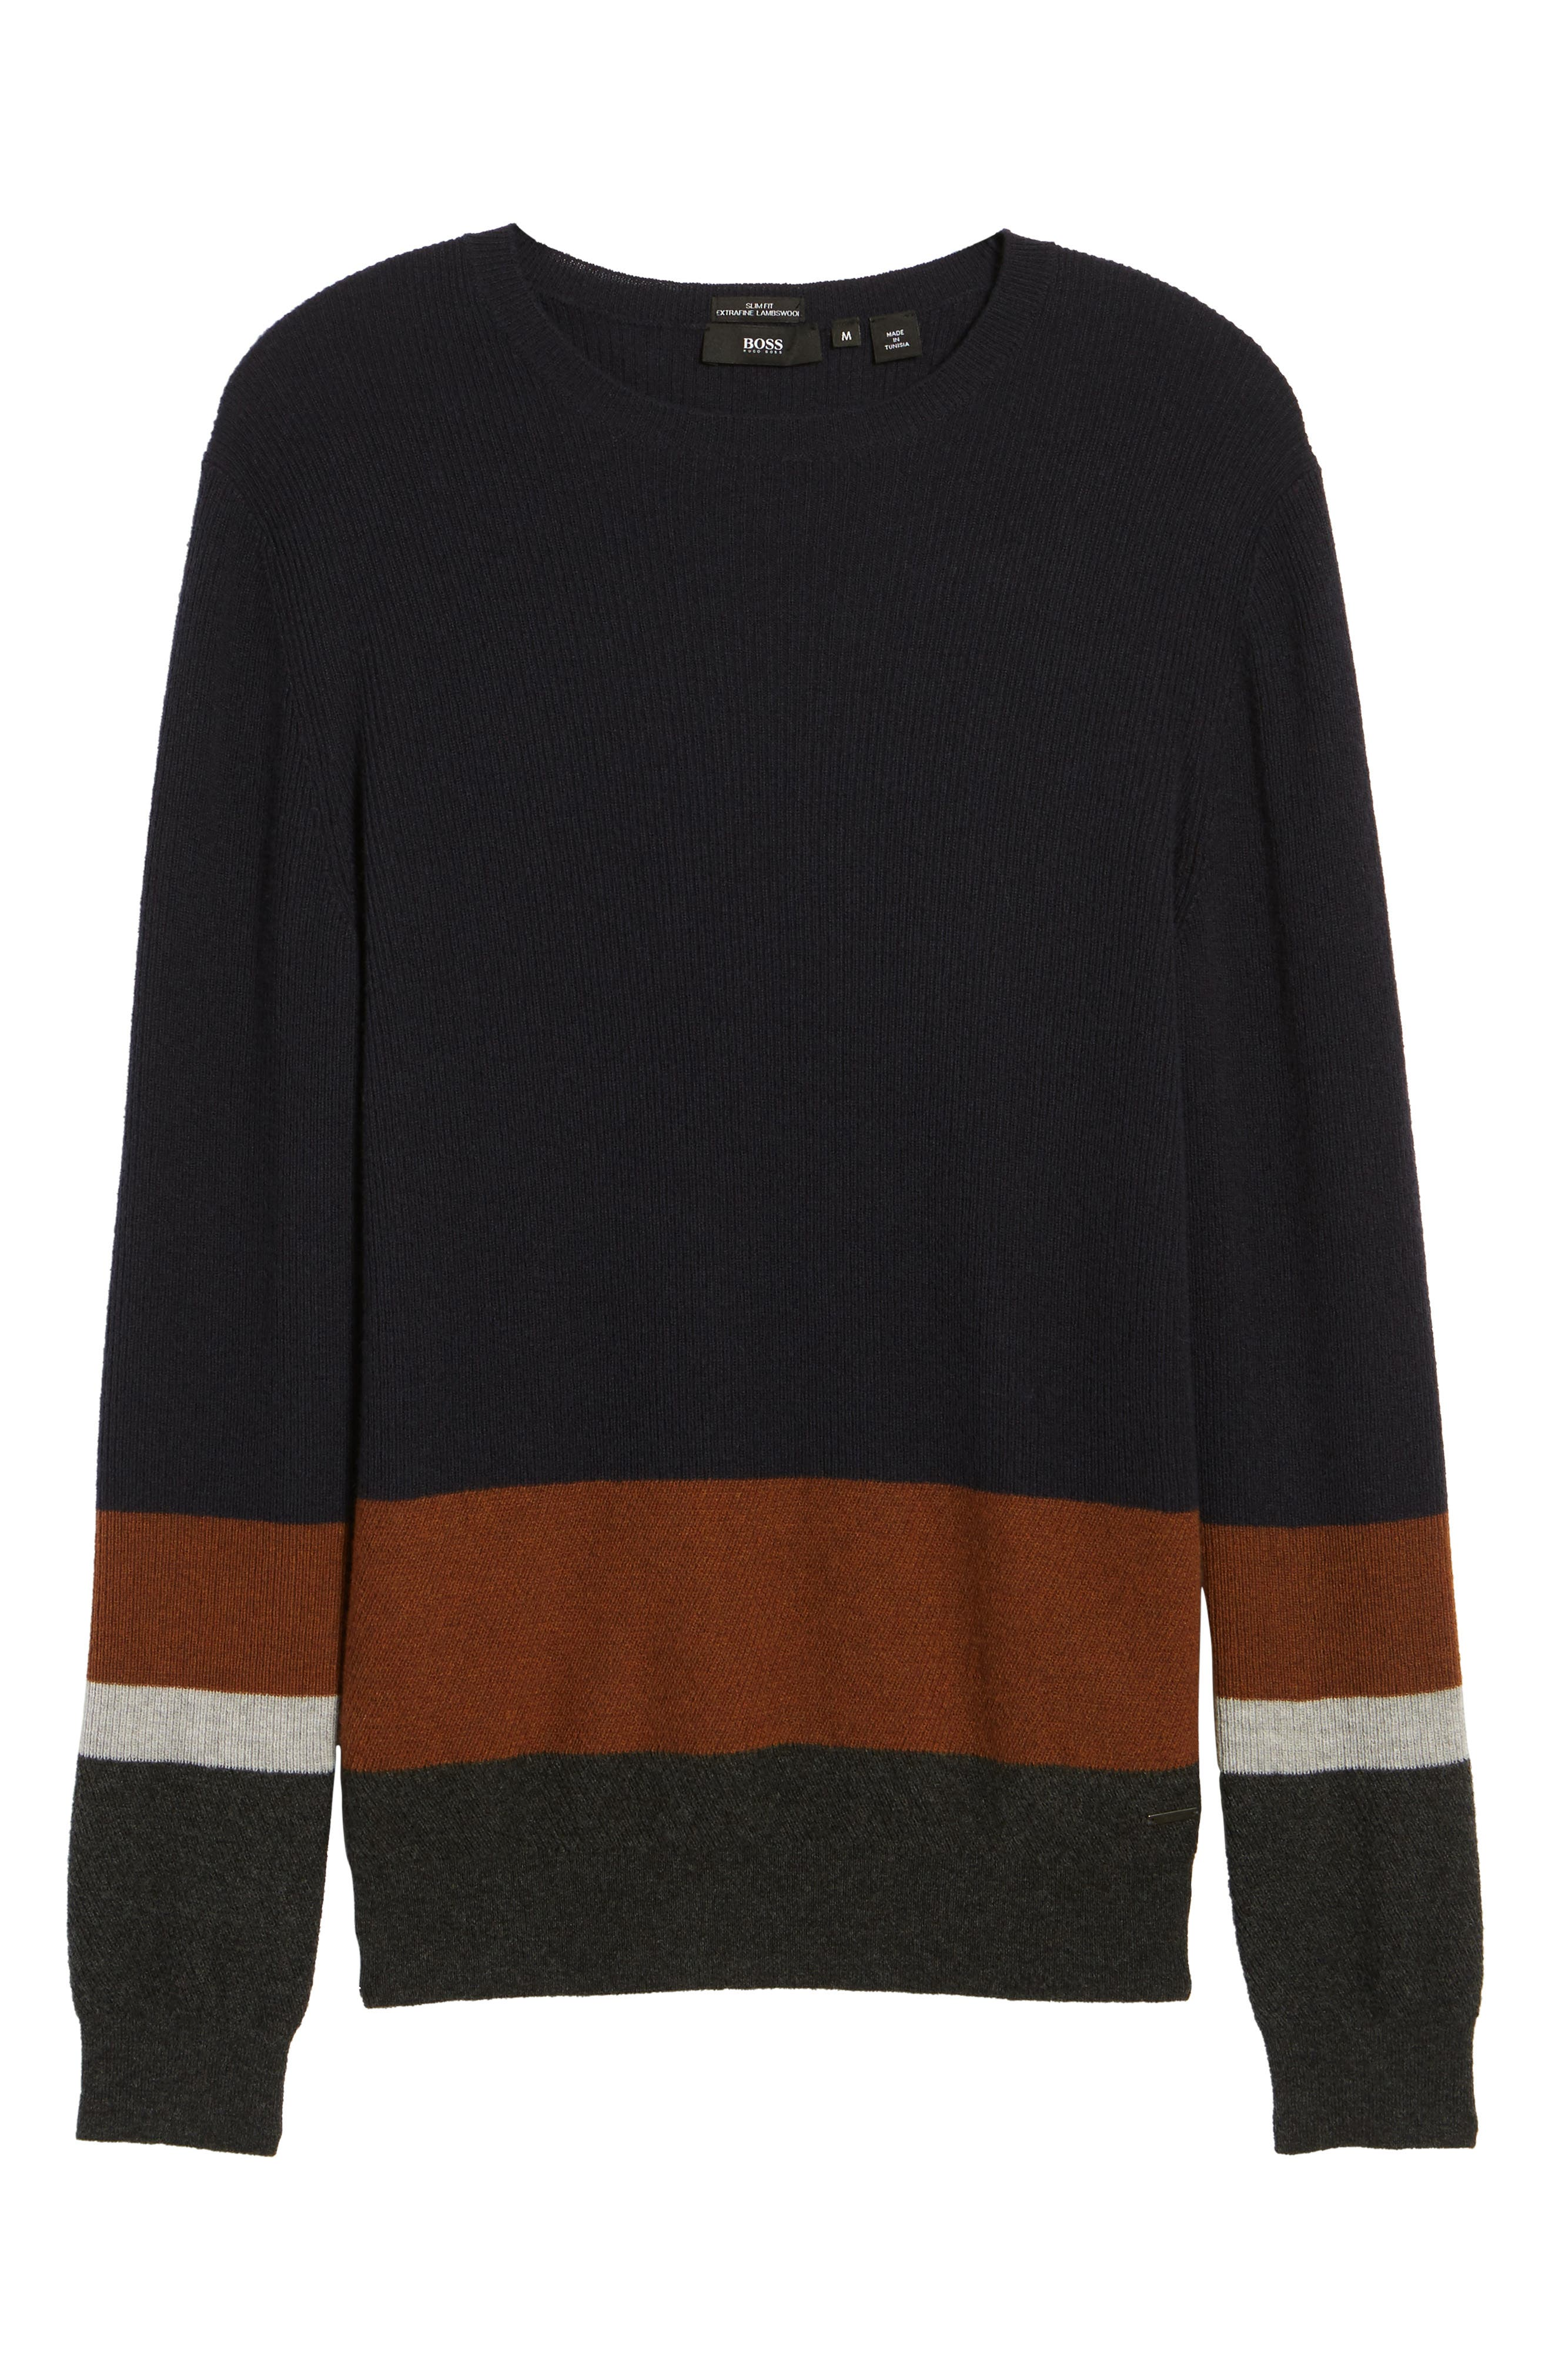 Colorblock Crewneck Sweater,                             Alternate thumbnail 6, color,                             410